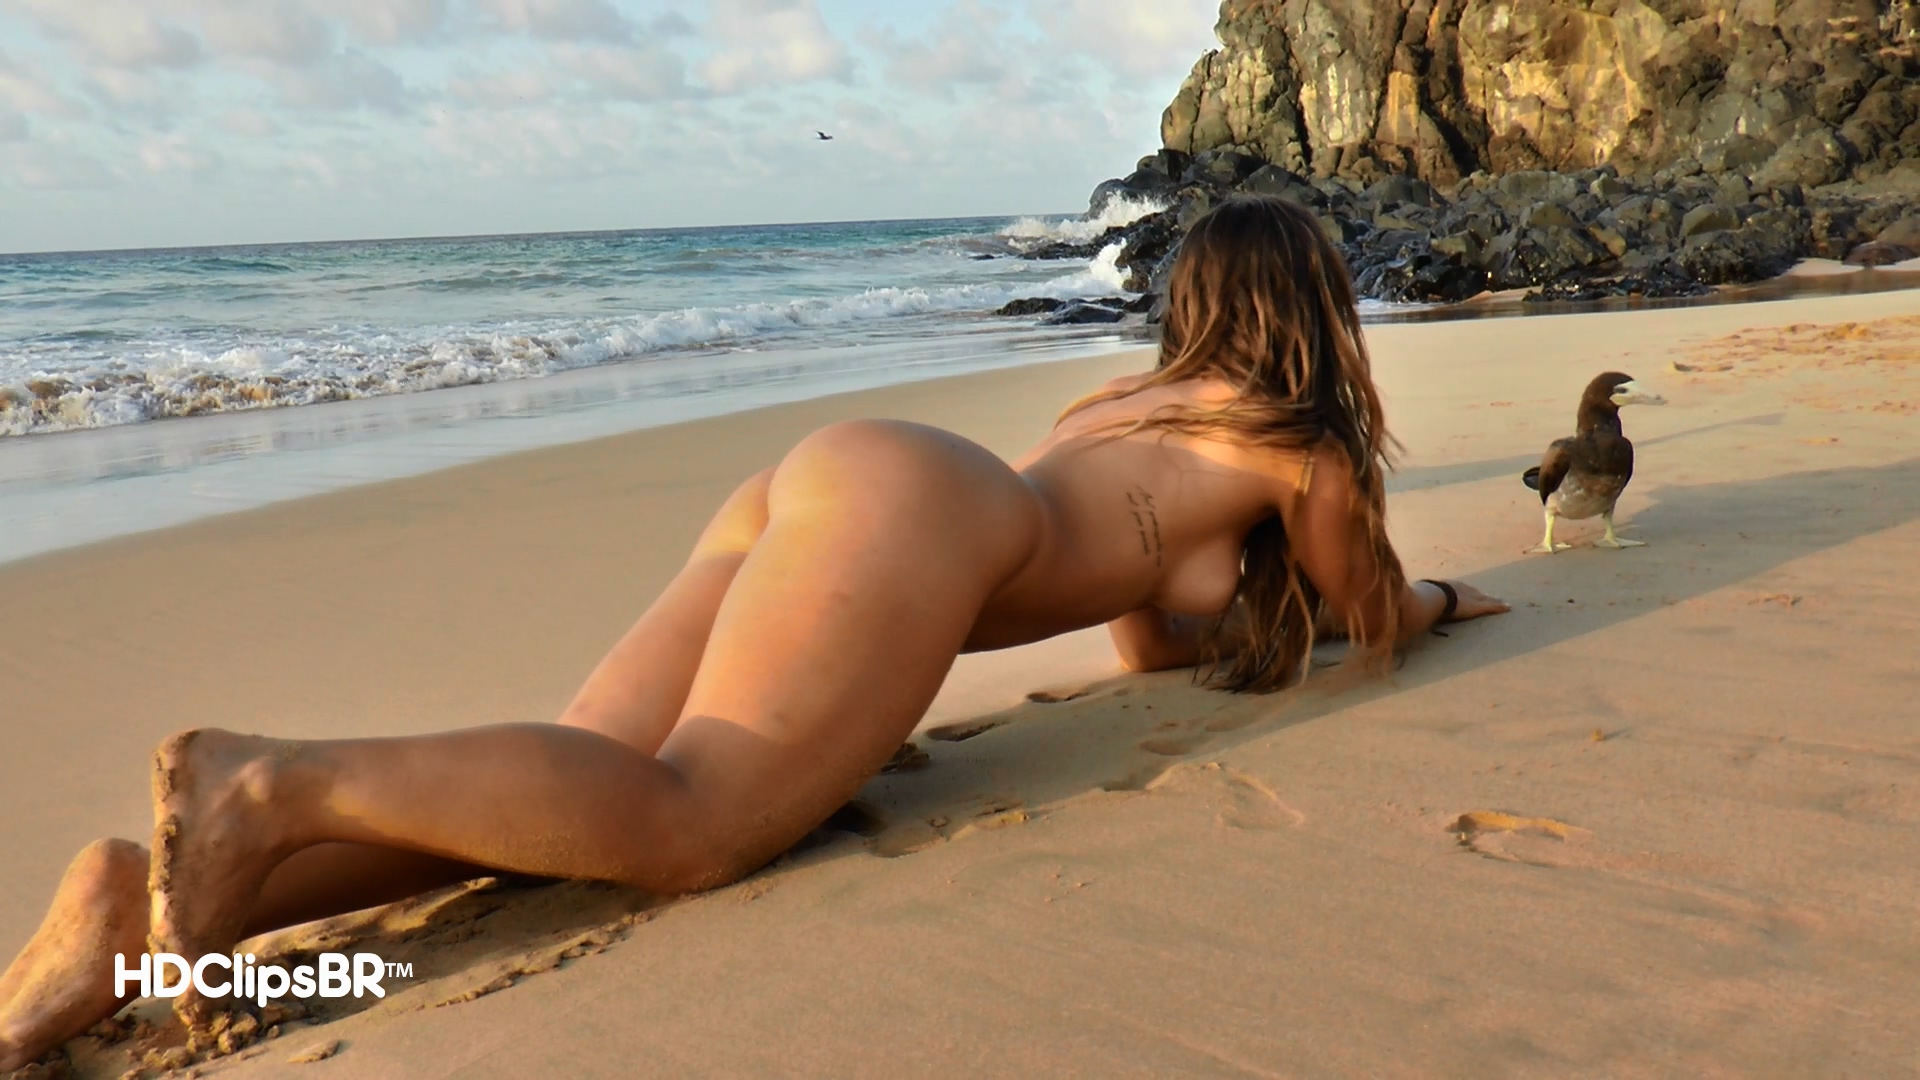 Aricia Silva Nua Na Sexy aricia silva pelada xvideos ⭐ n�o conto